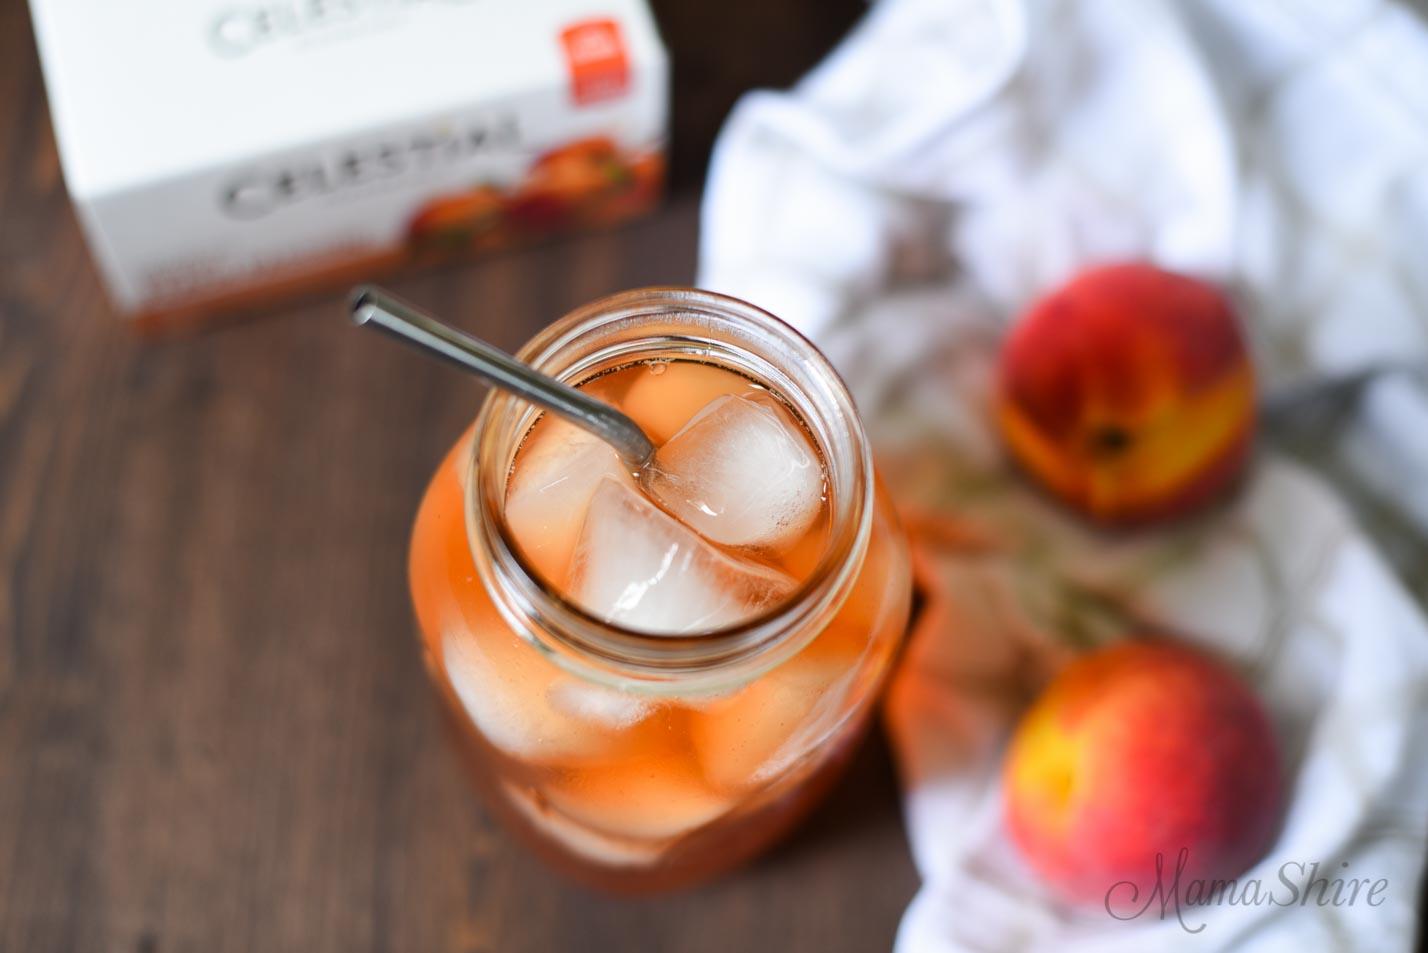 Peach Good Girl Moonshine - Sugar-free, Low-carb